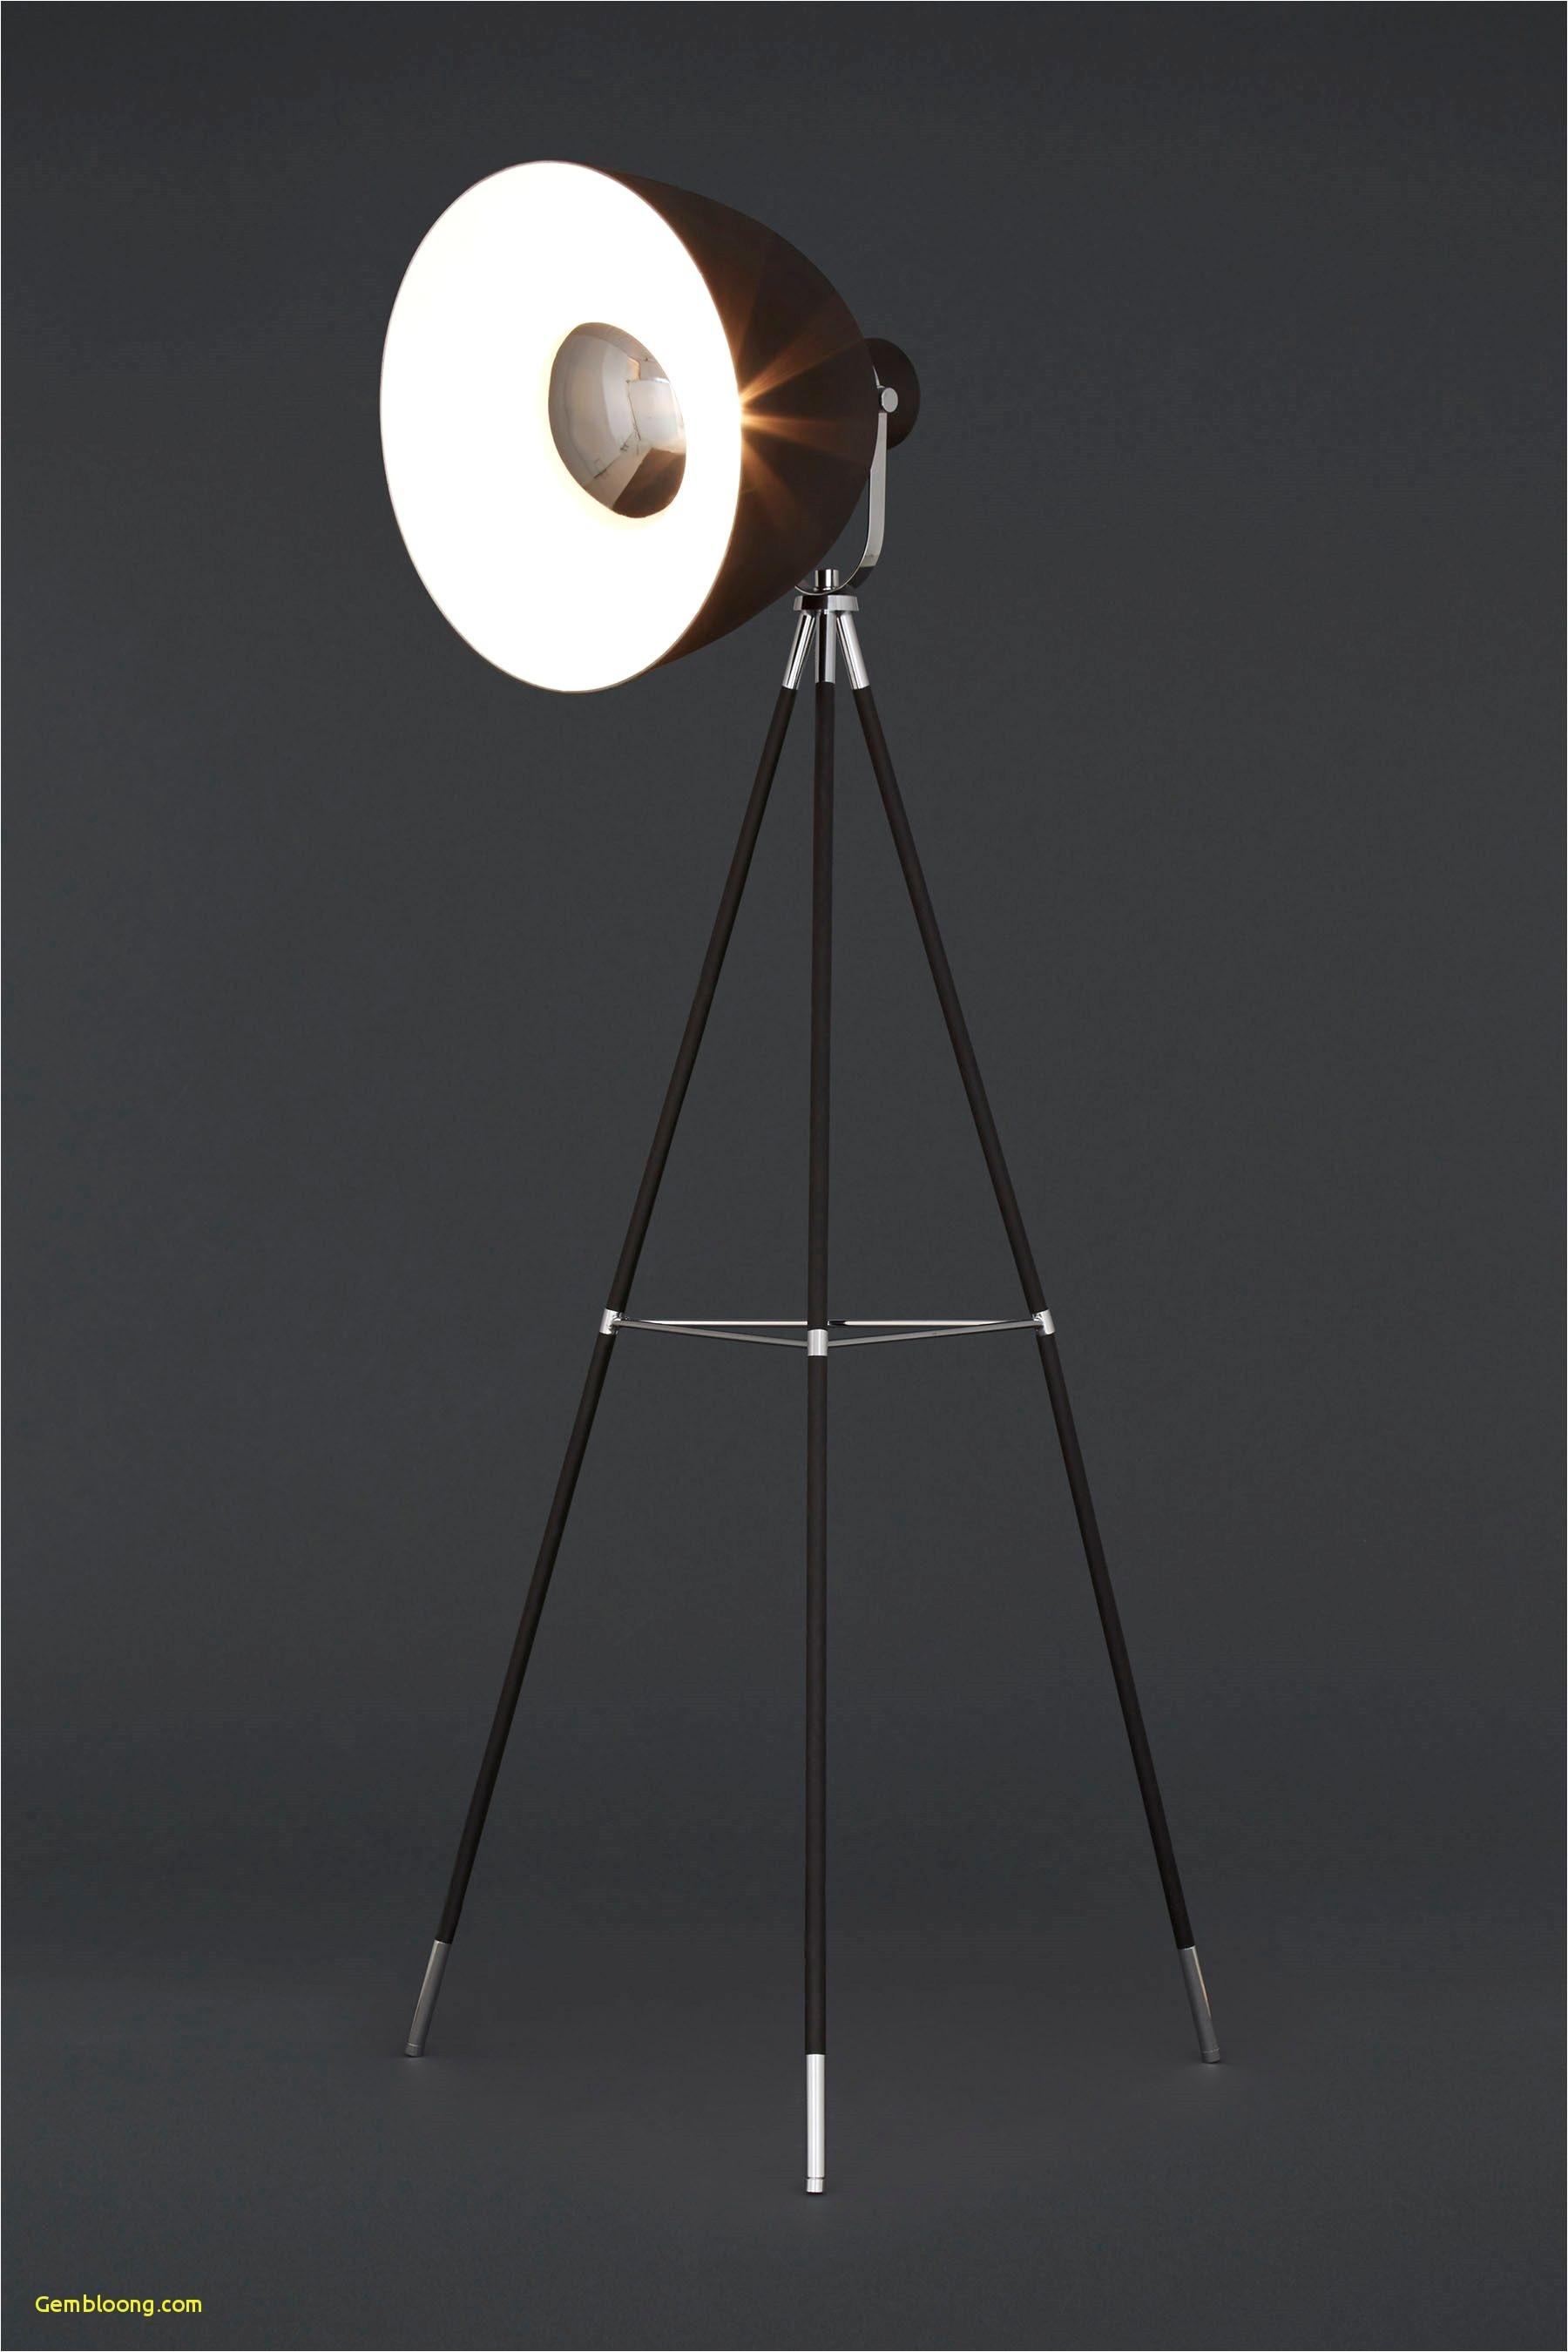 Home Depot Standing Lamps Floor Lamps At Home Depot Fresh West Elm Arc Floor  Lamp Best